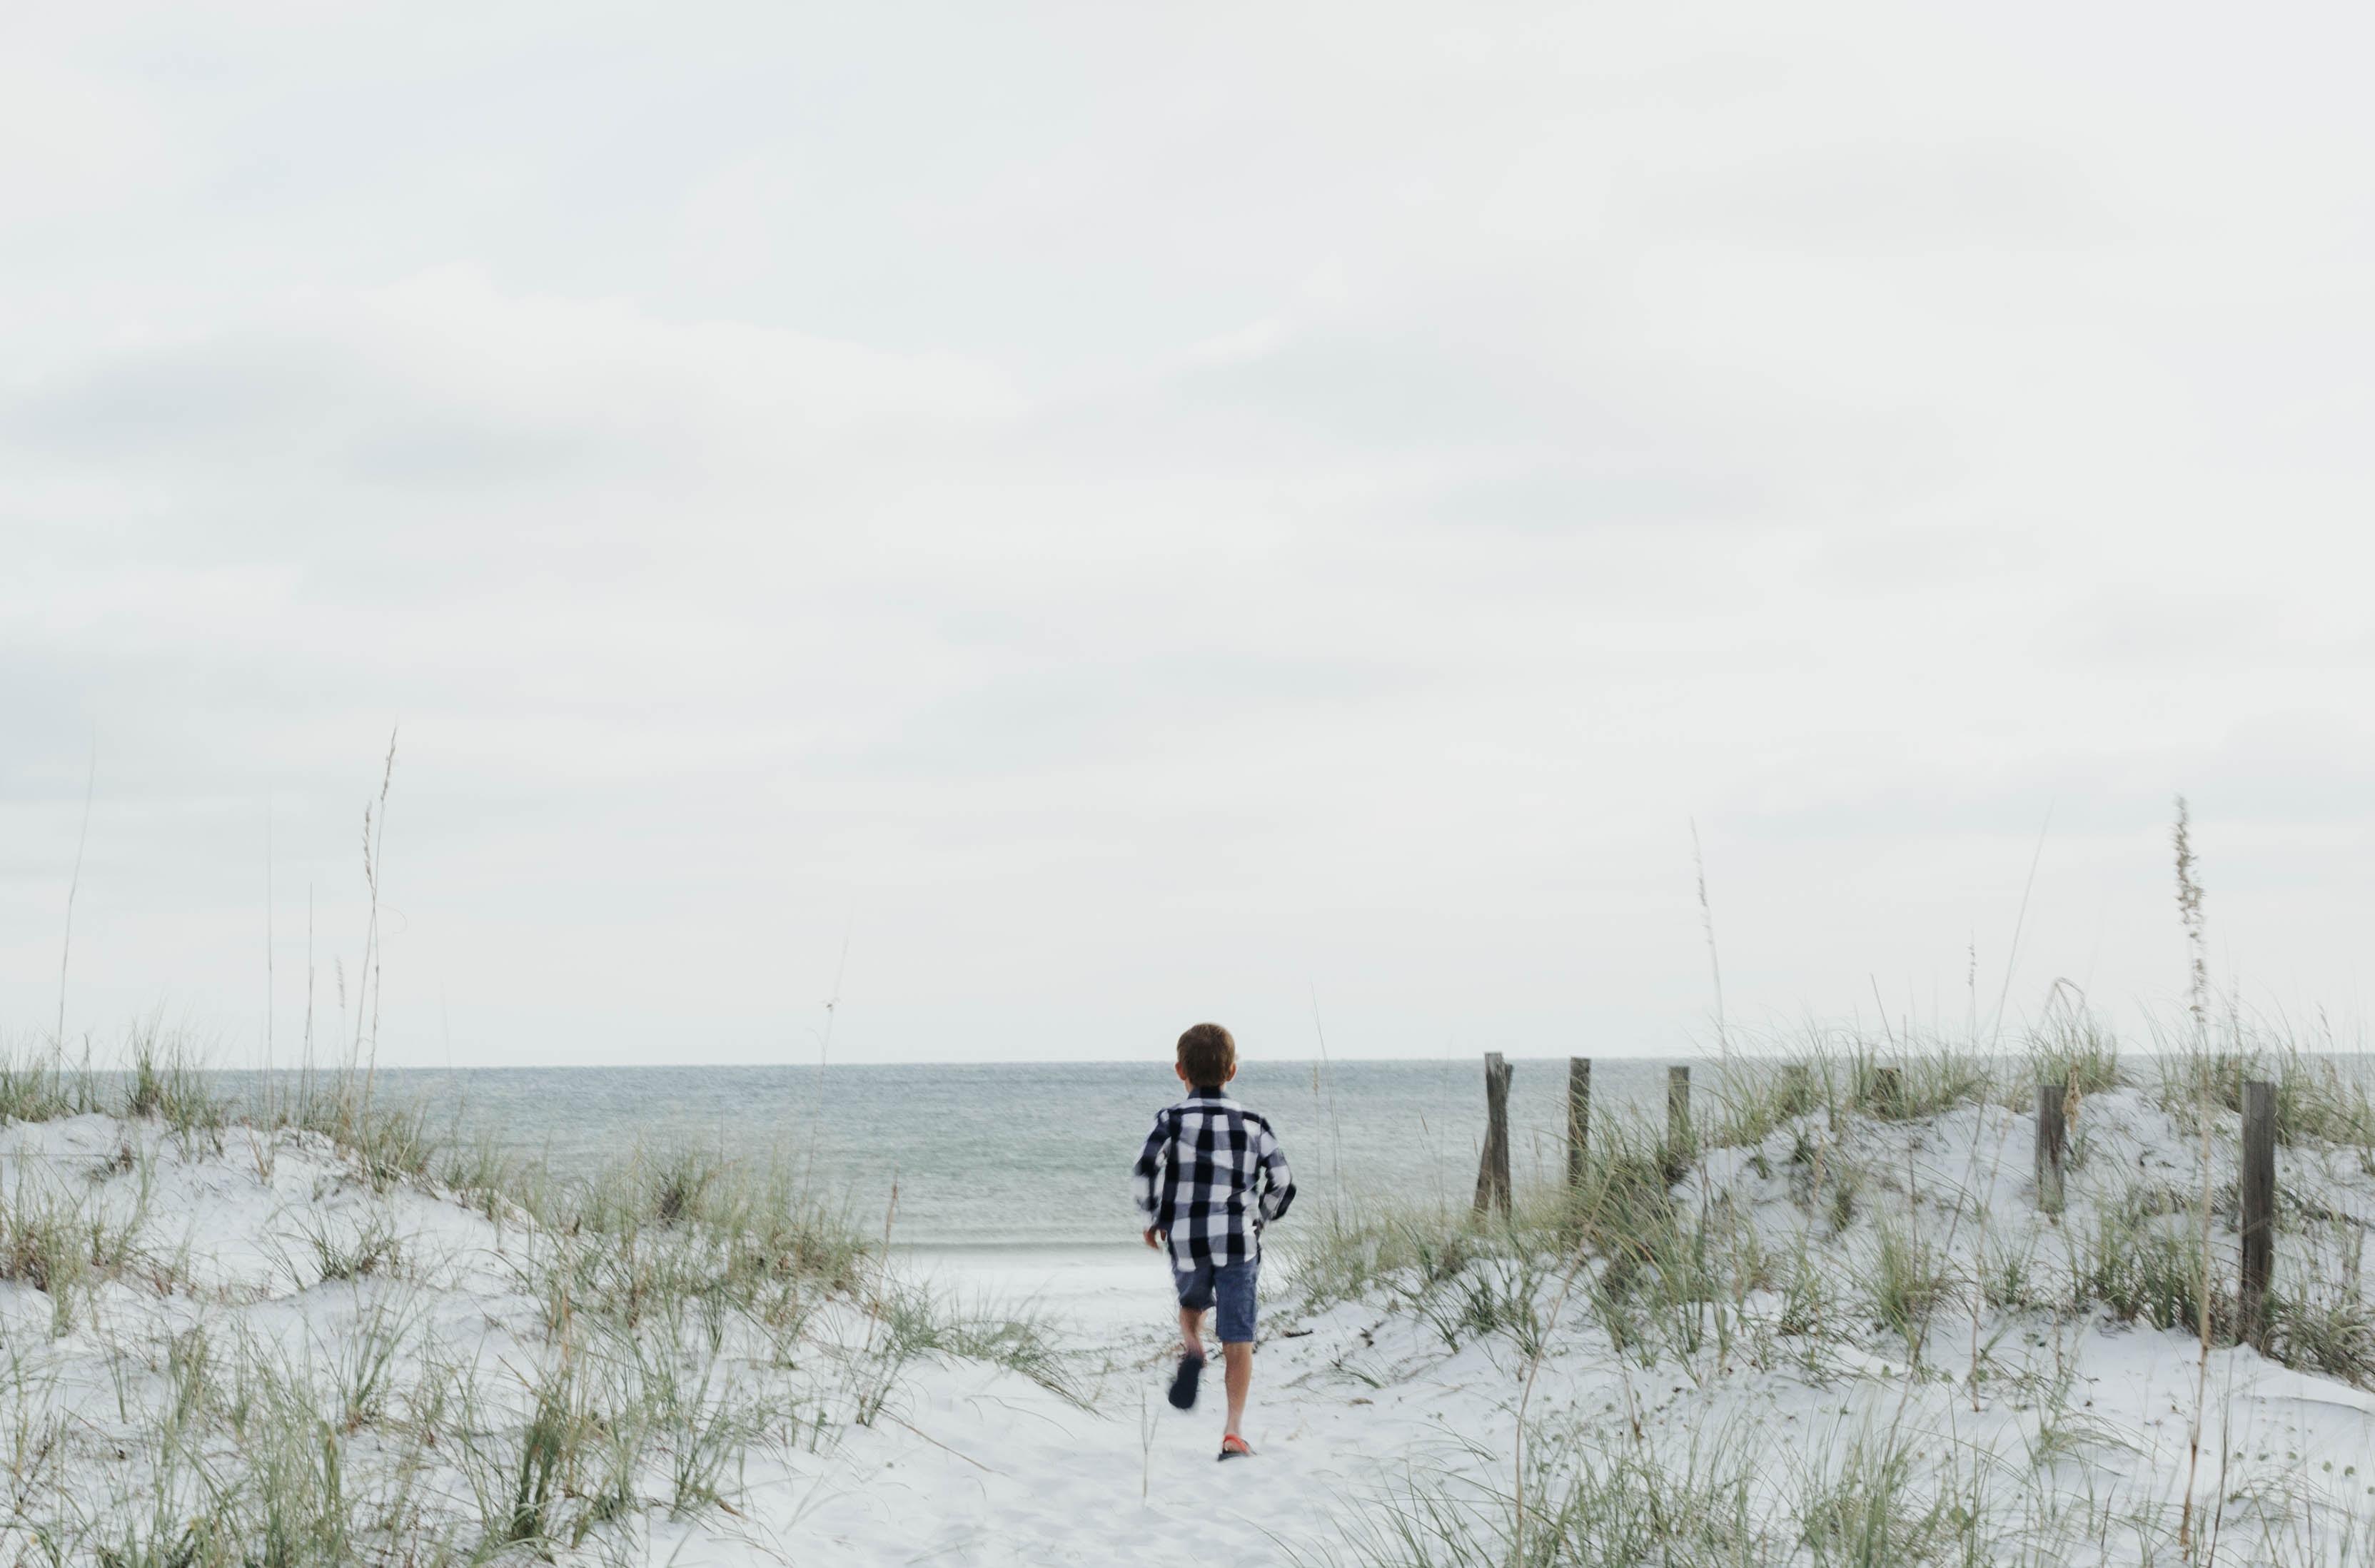 boy running near body of water